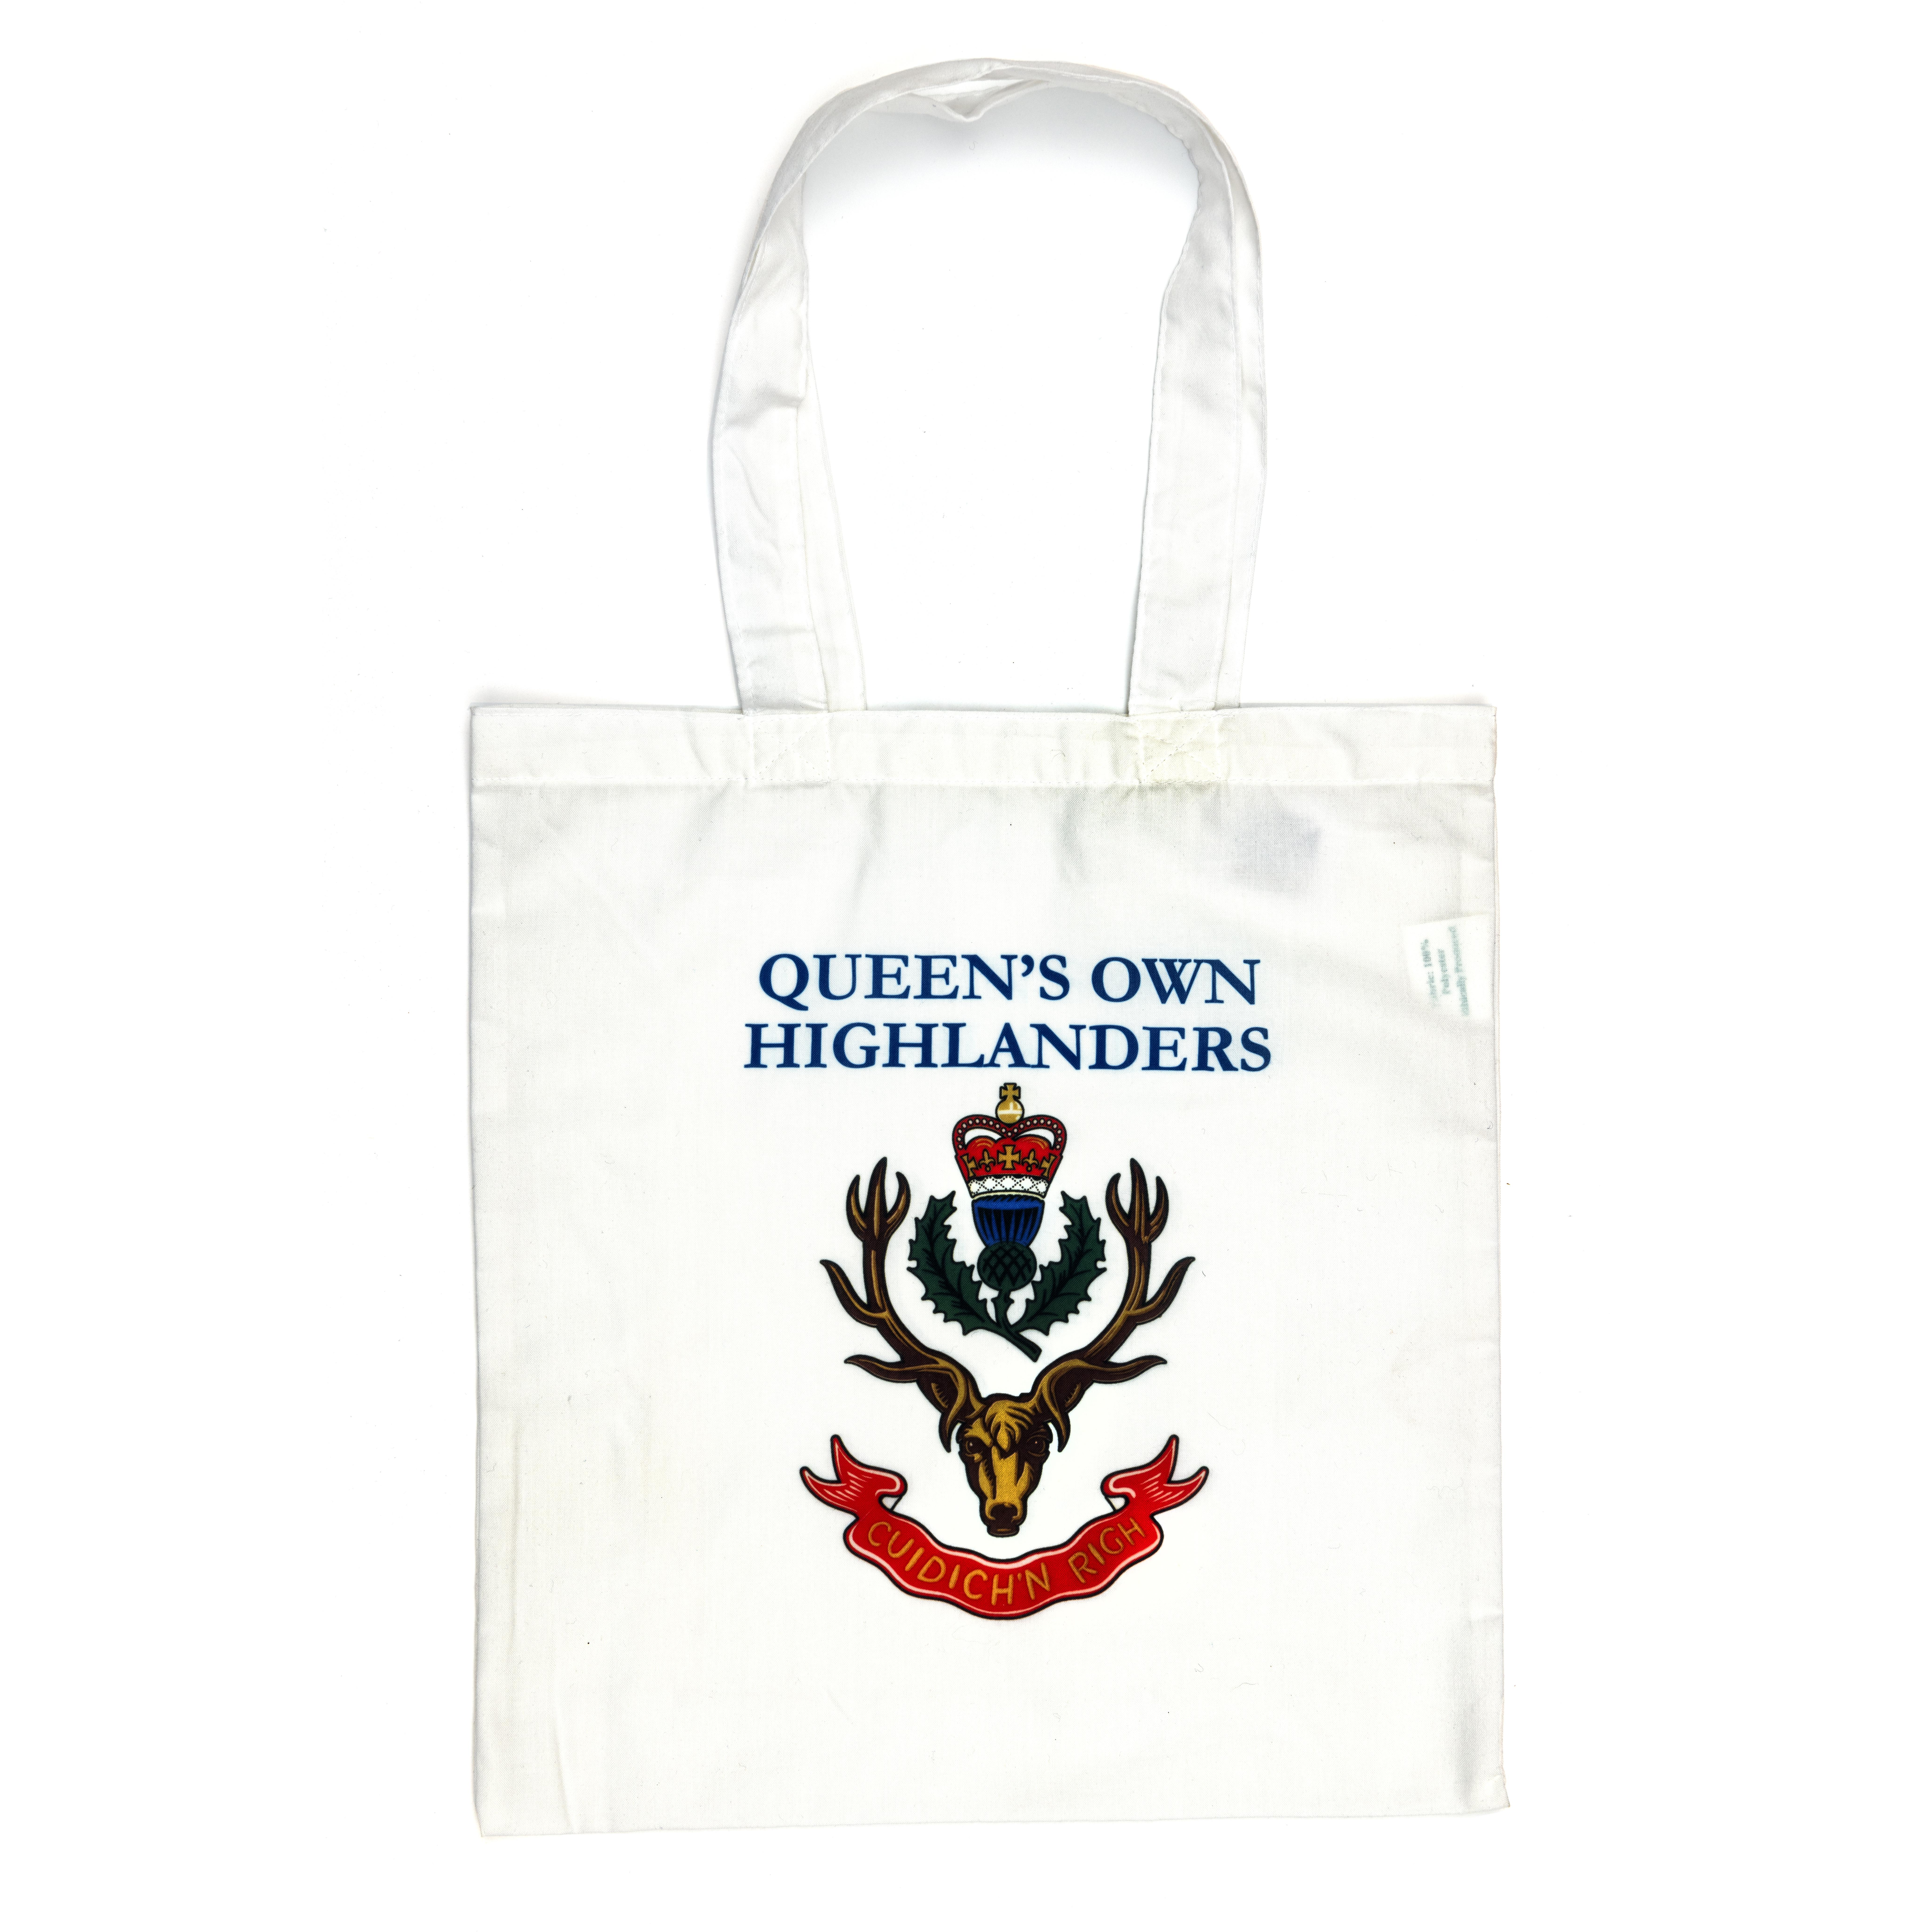 Queen's Own Highlanders Tote Bag